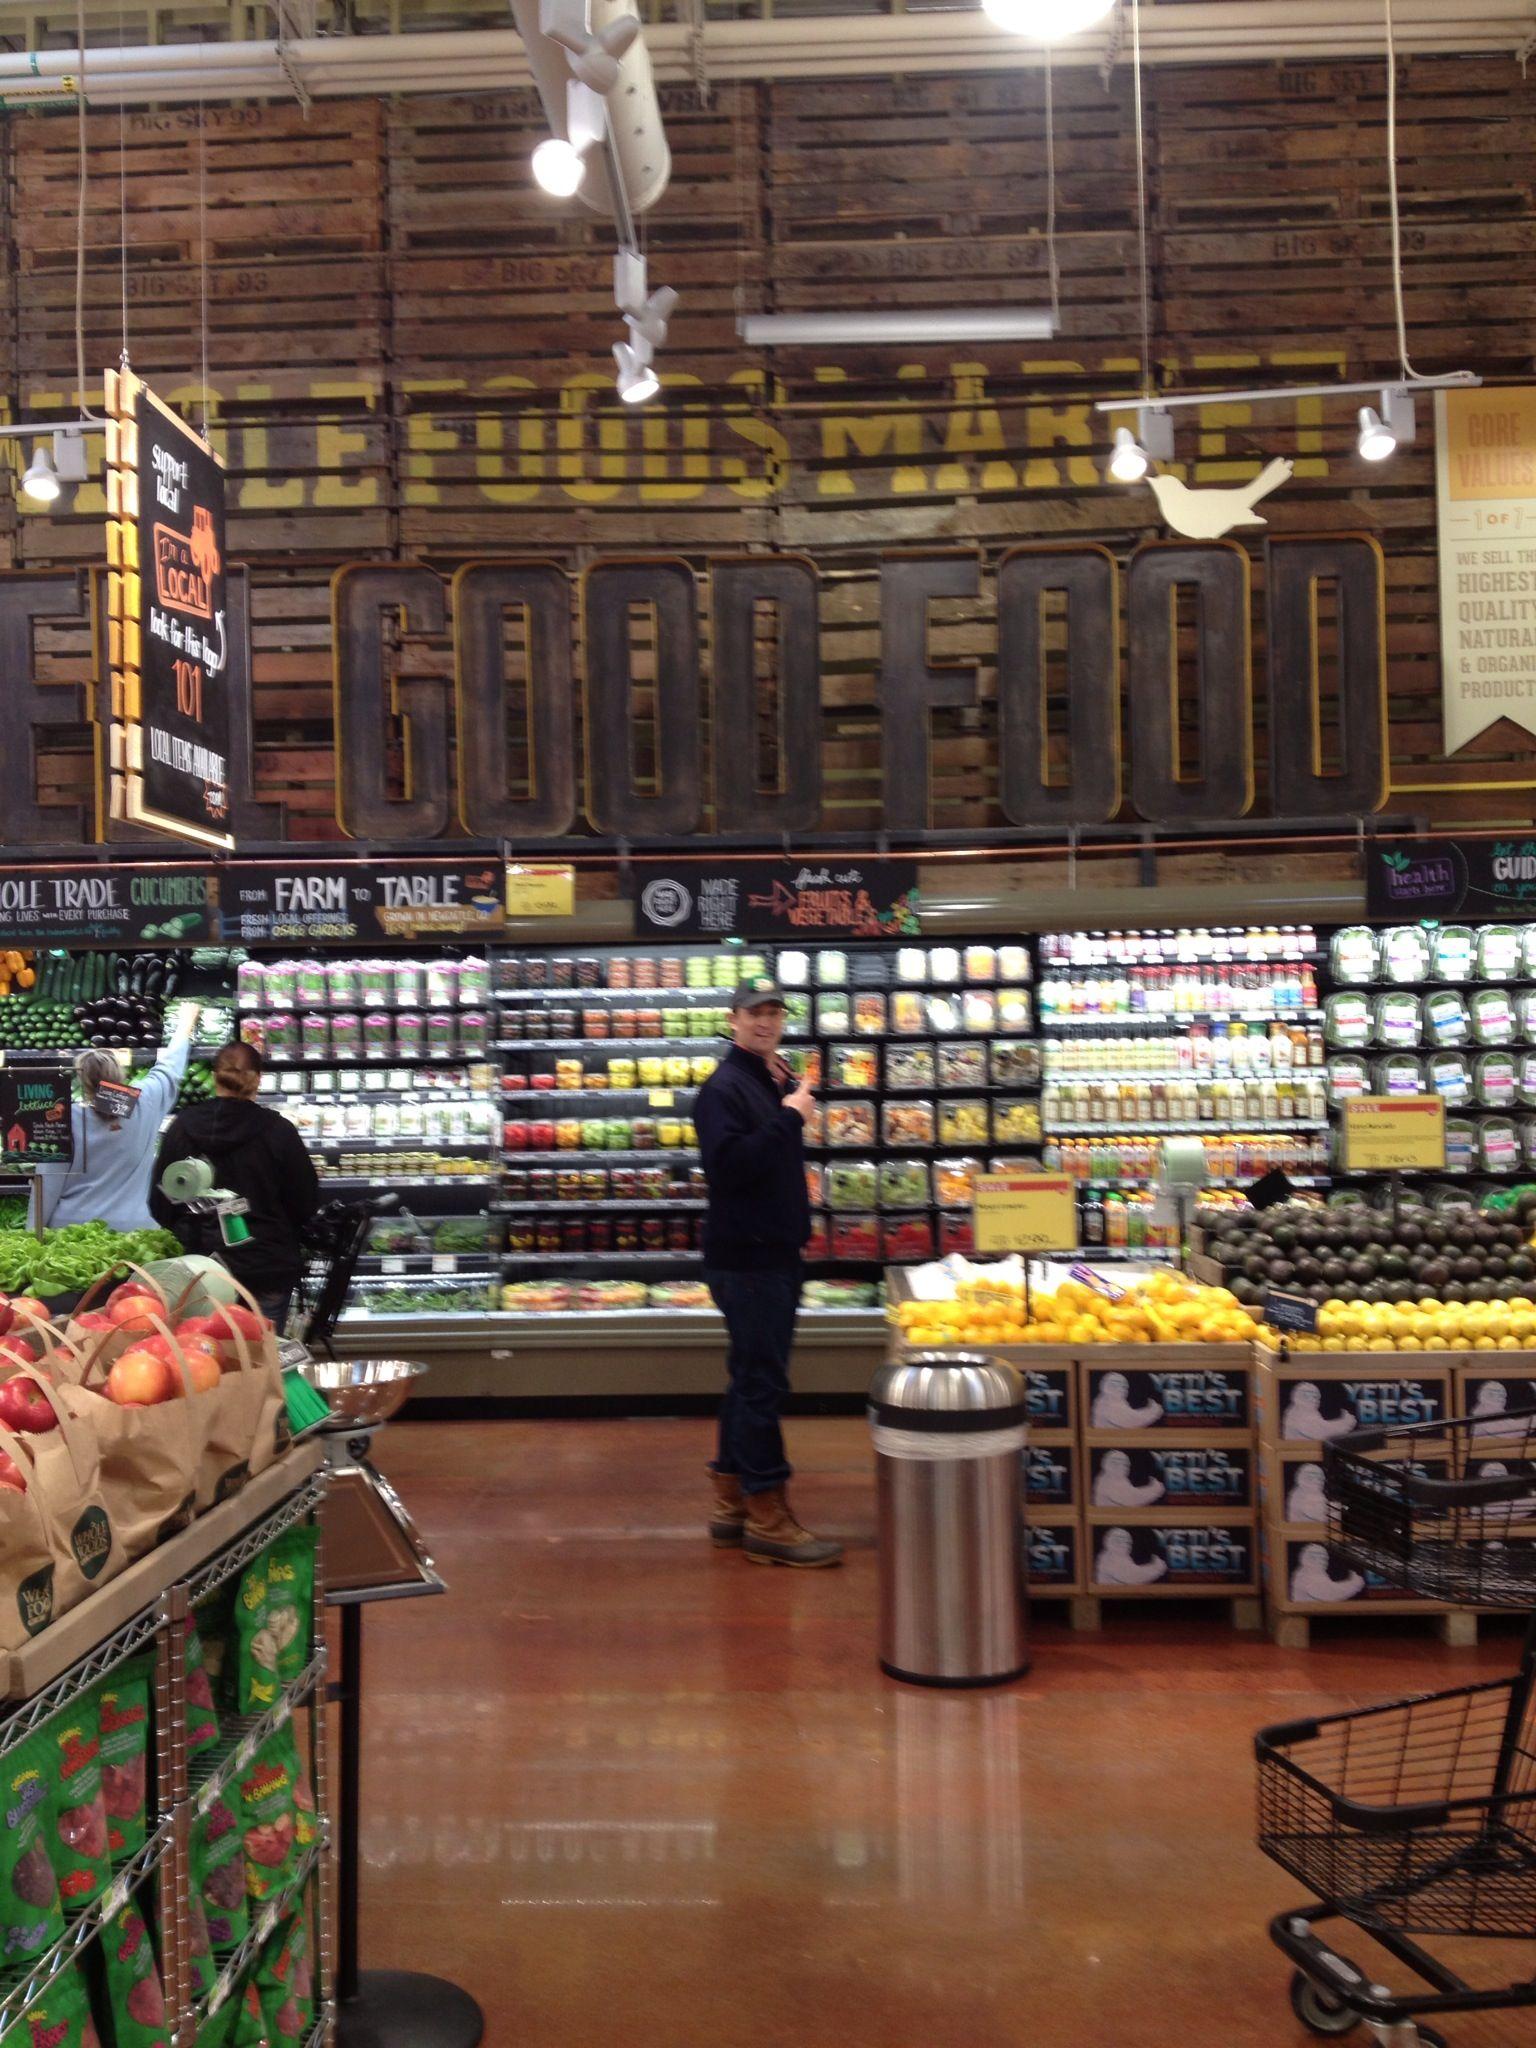 Pin Carrie Pallet Supermarket Design Food Retail Signage